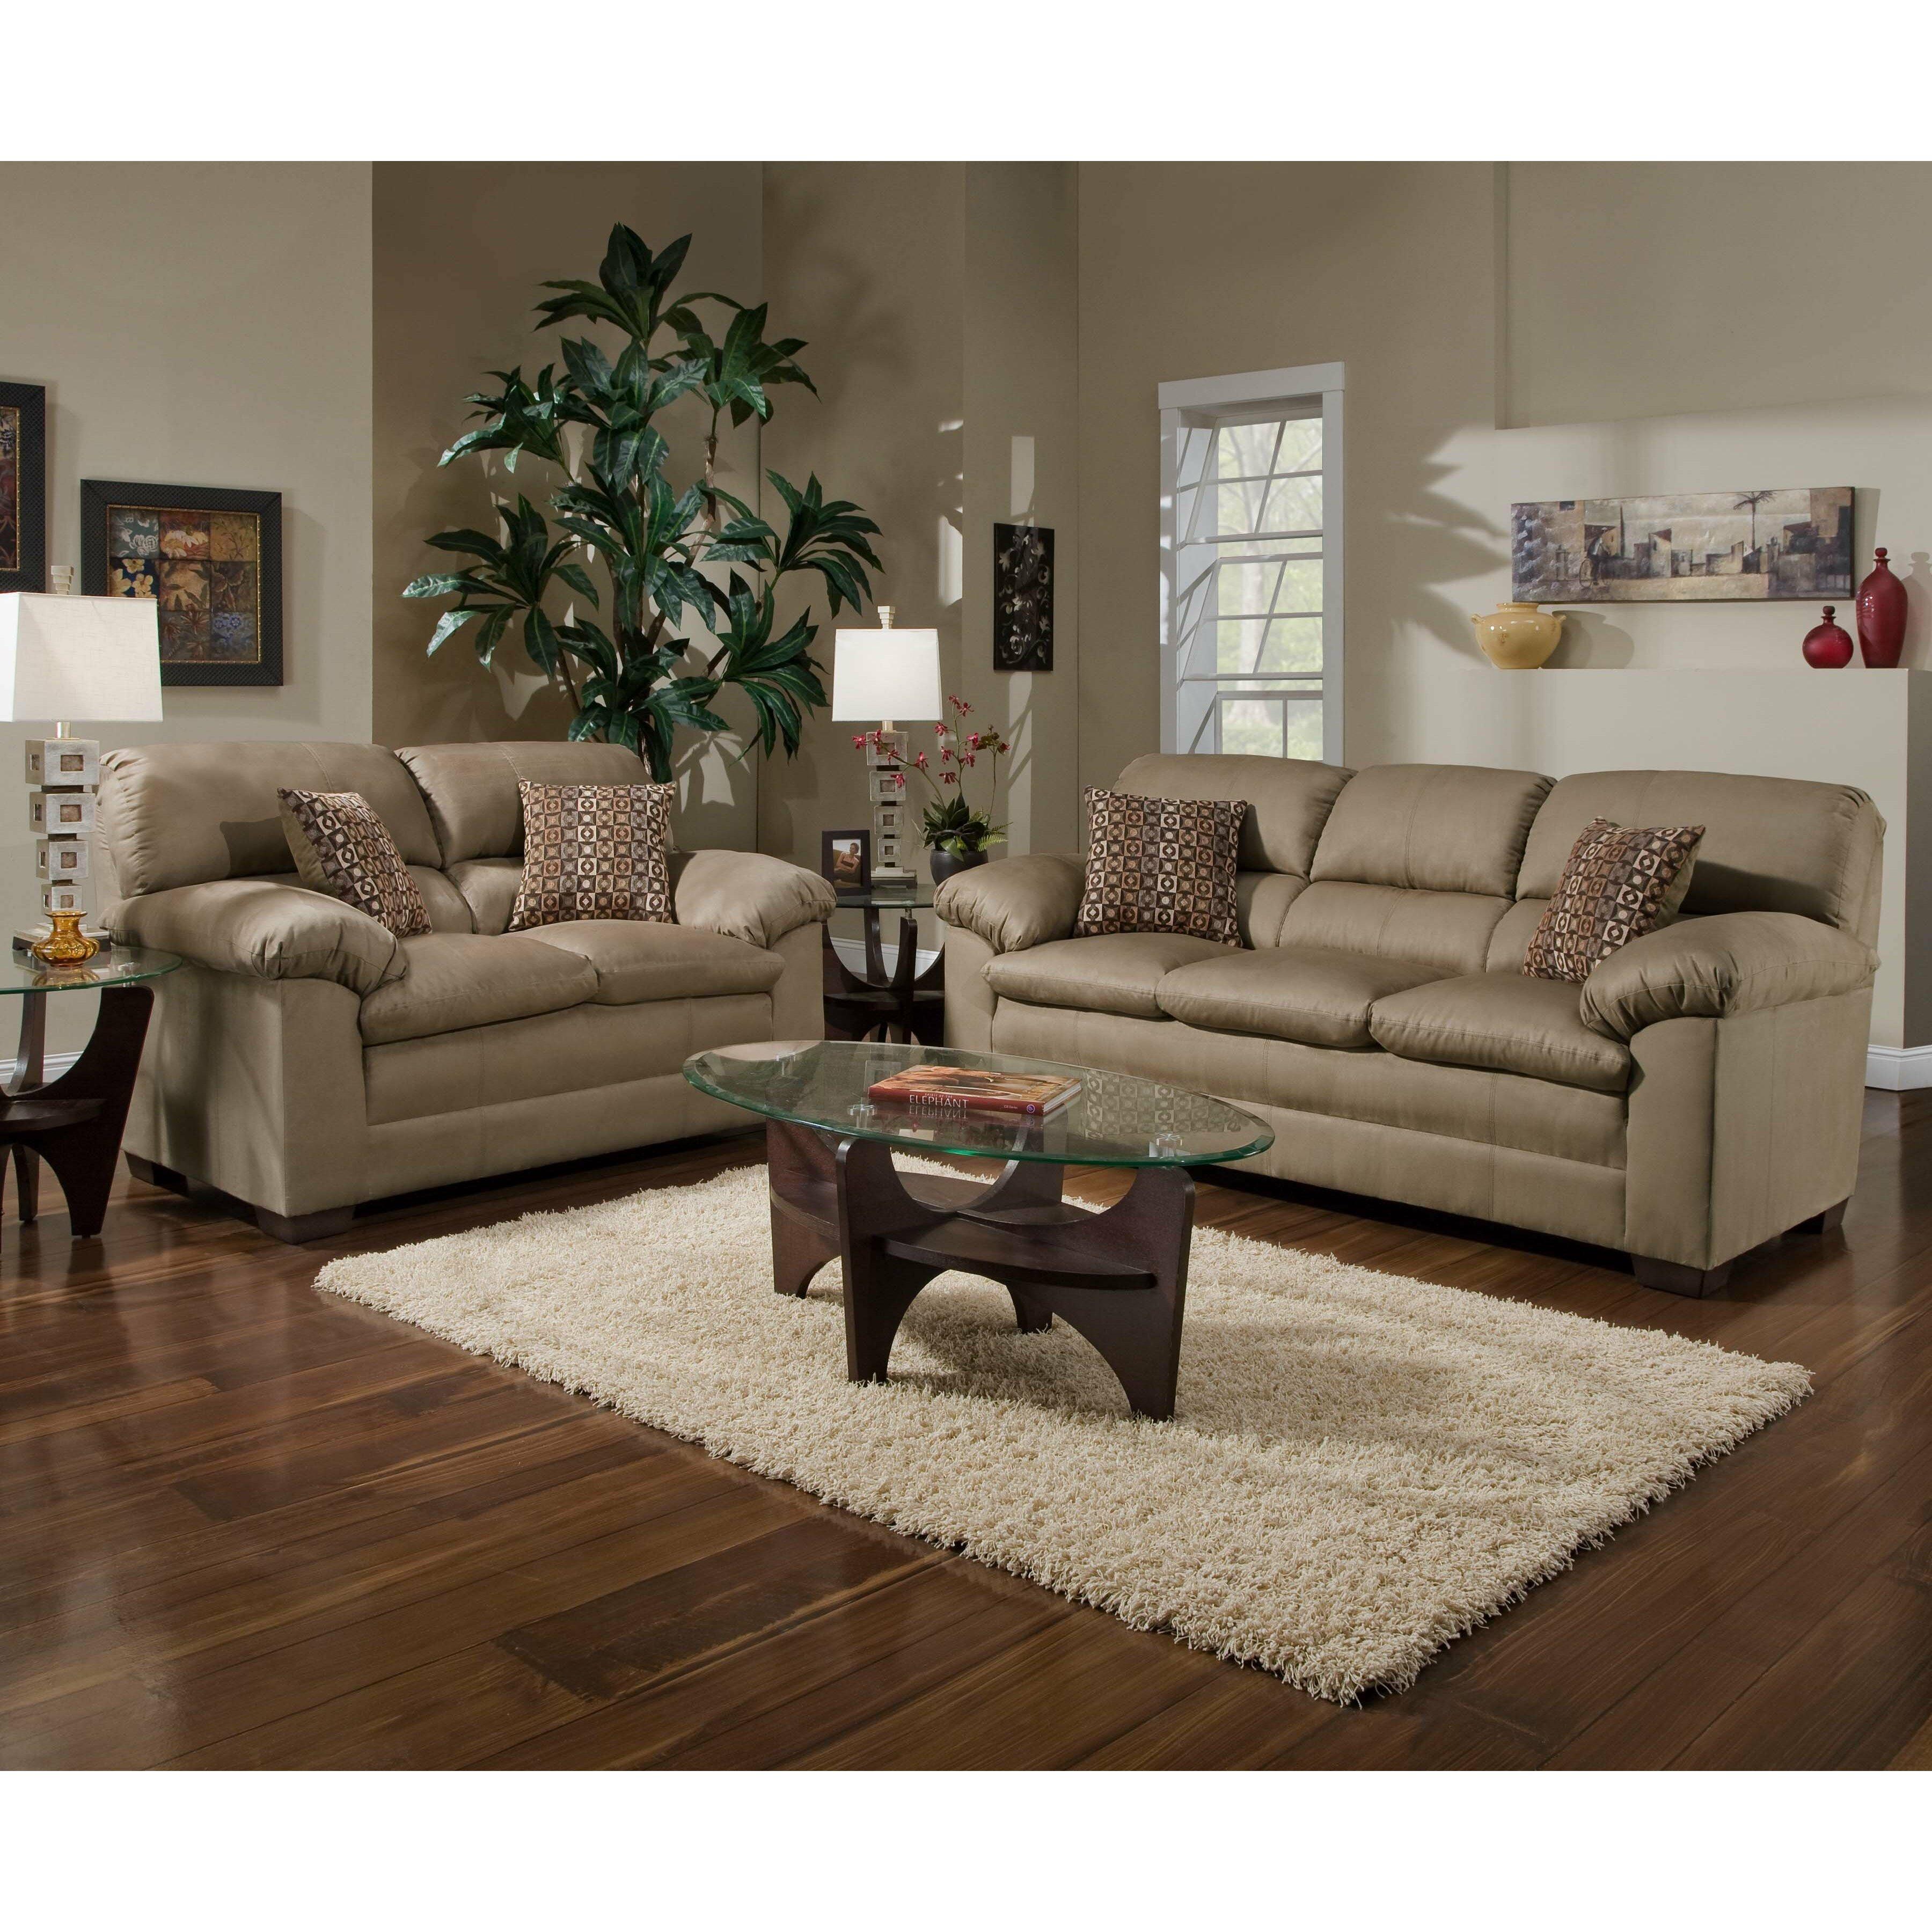 Simmons Upholstery Velocity Sofa Reviews Wayfair